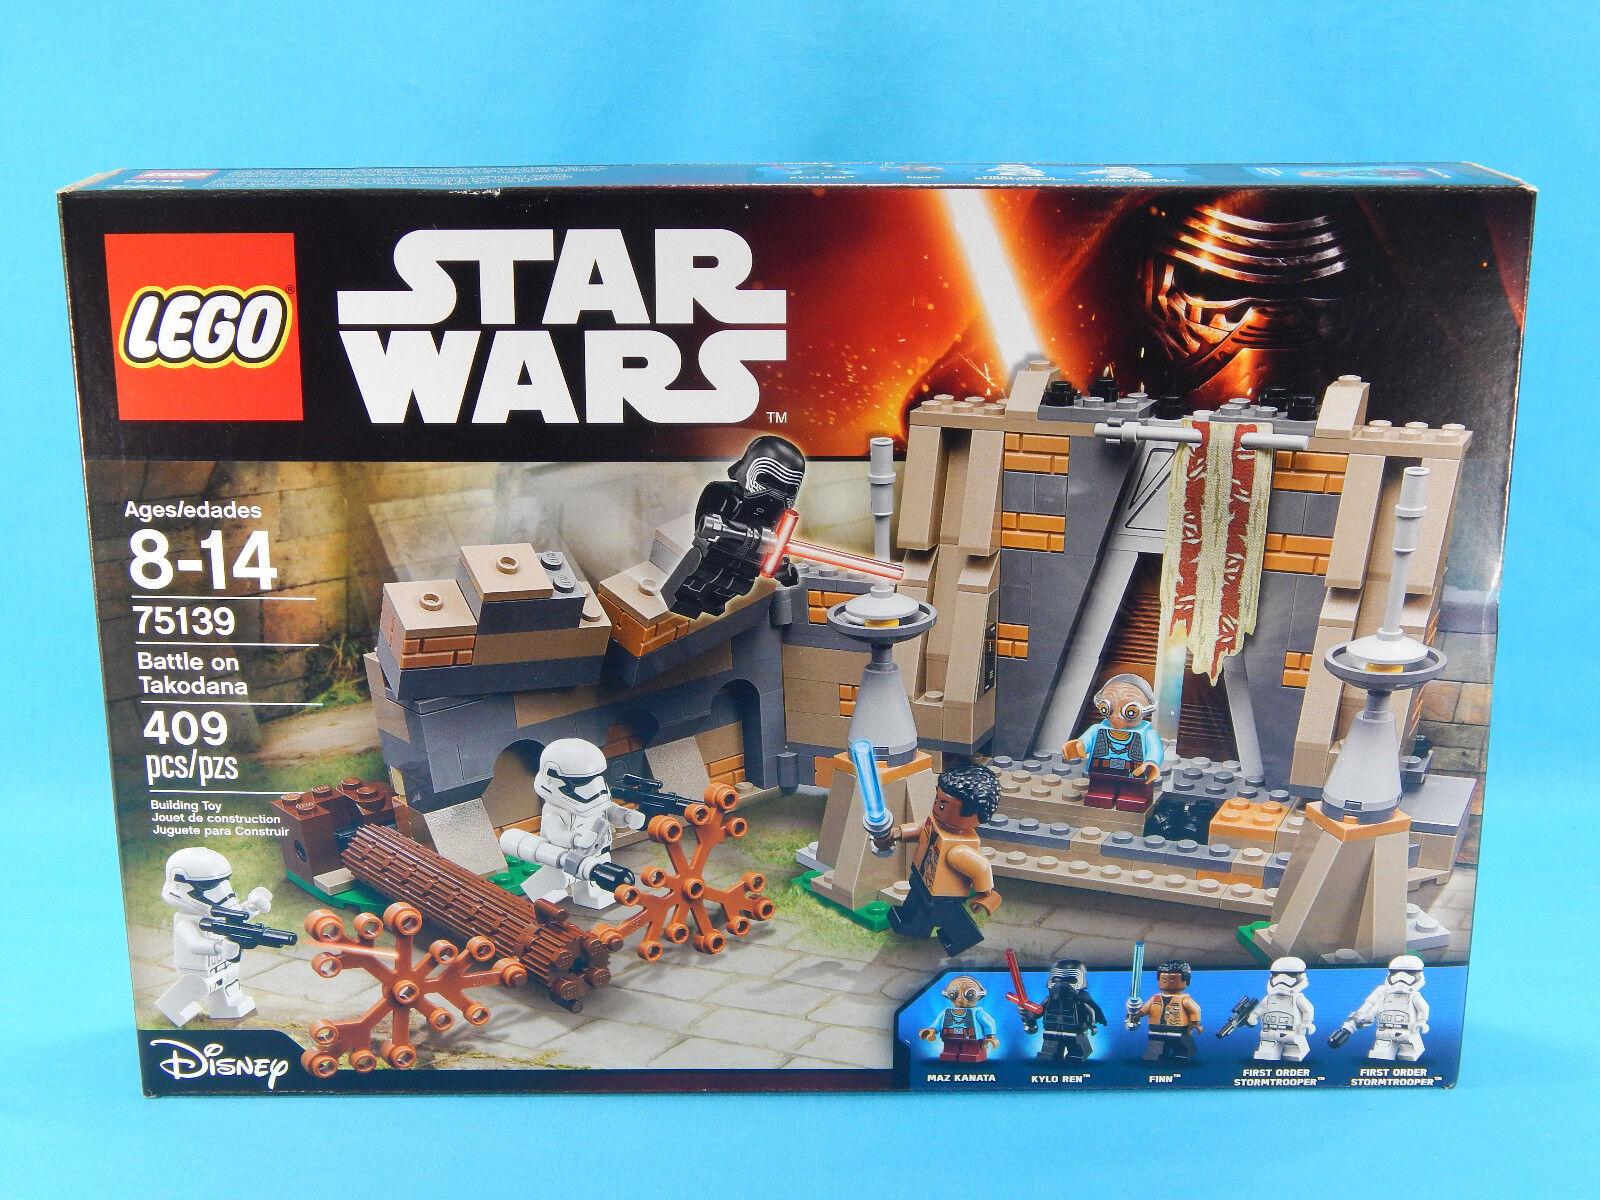 Lego Star Wars 75139 Battle on Takodana 409pcs Sealed 2016